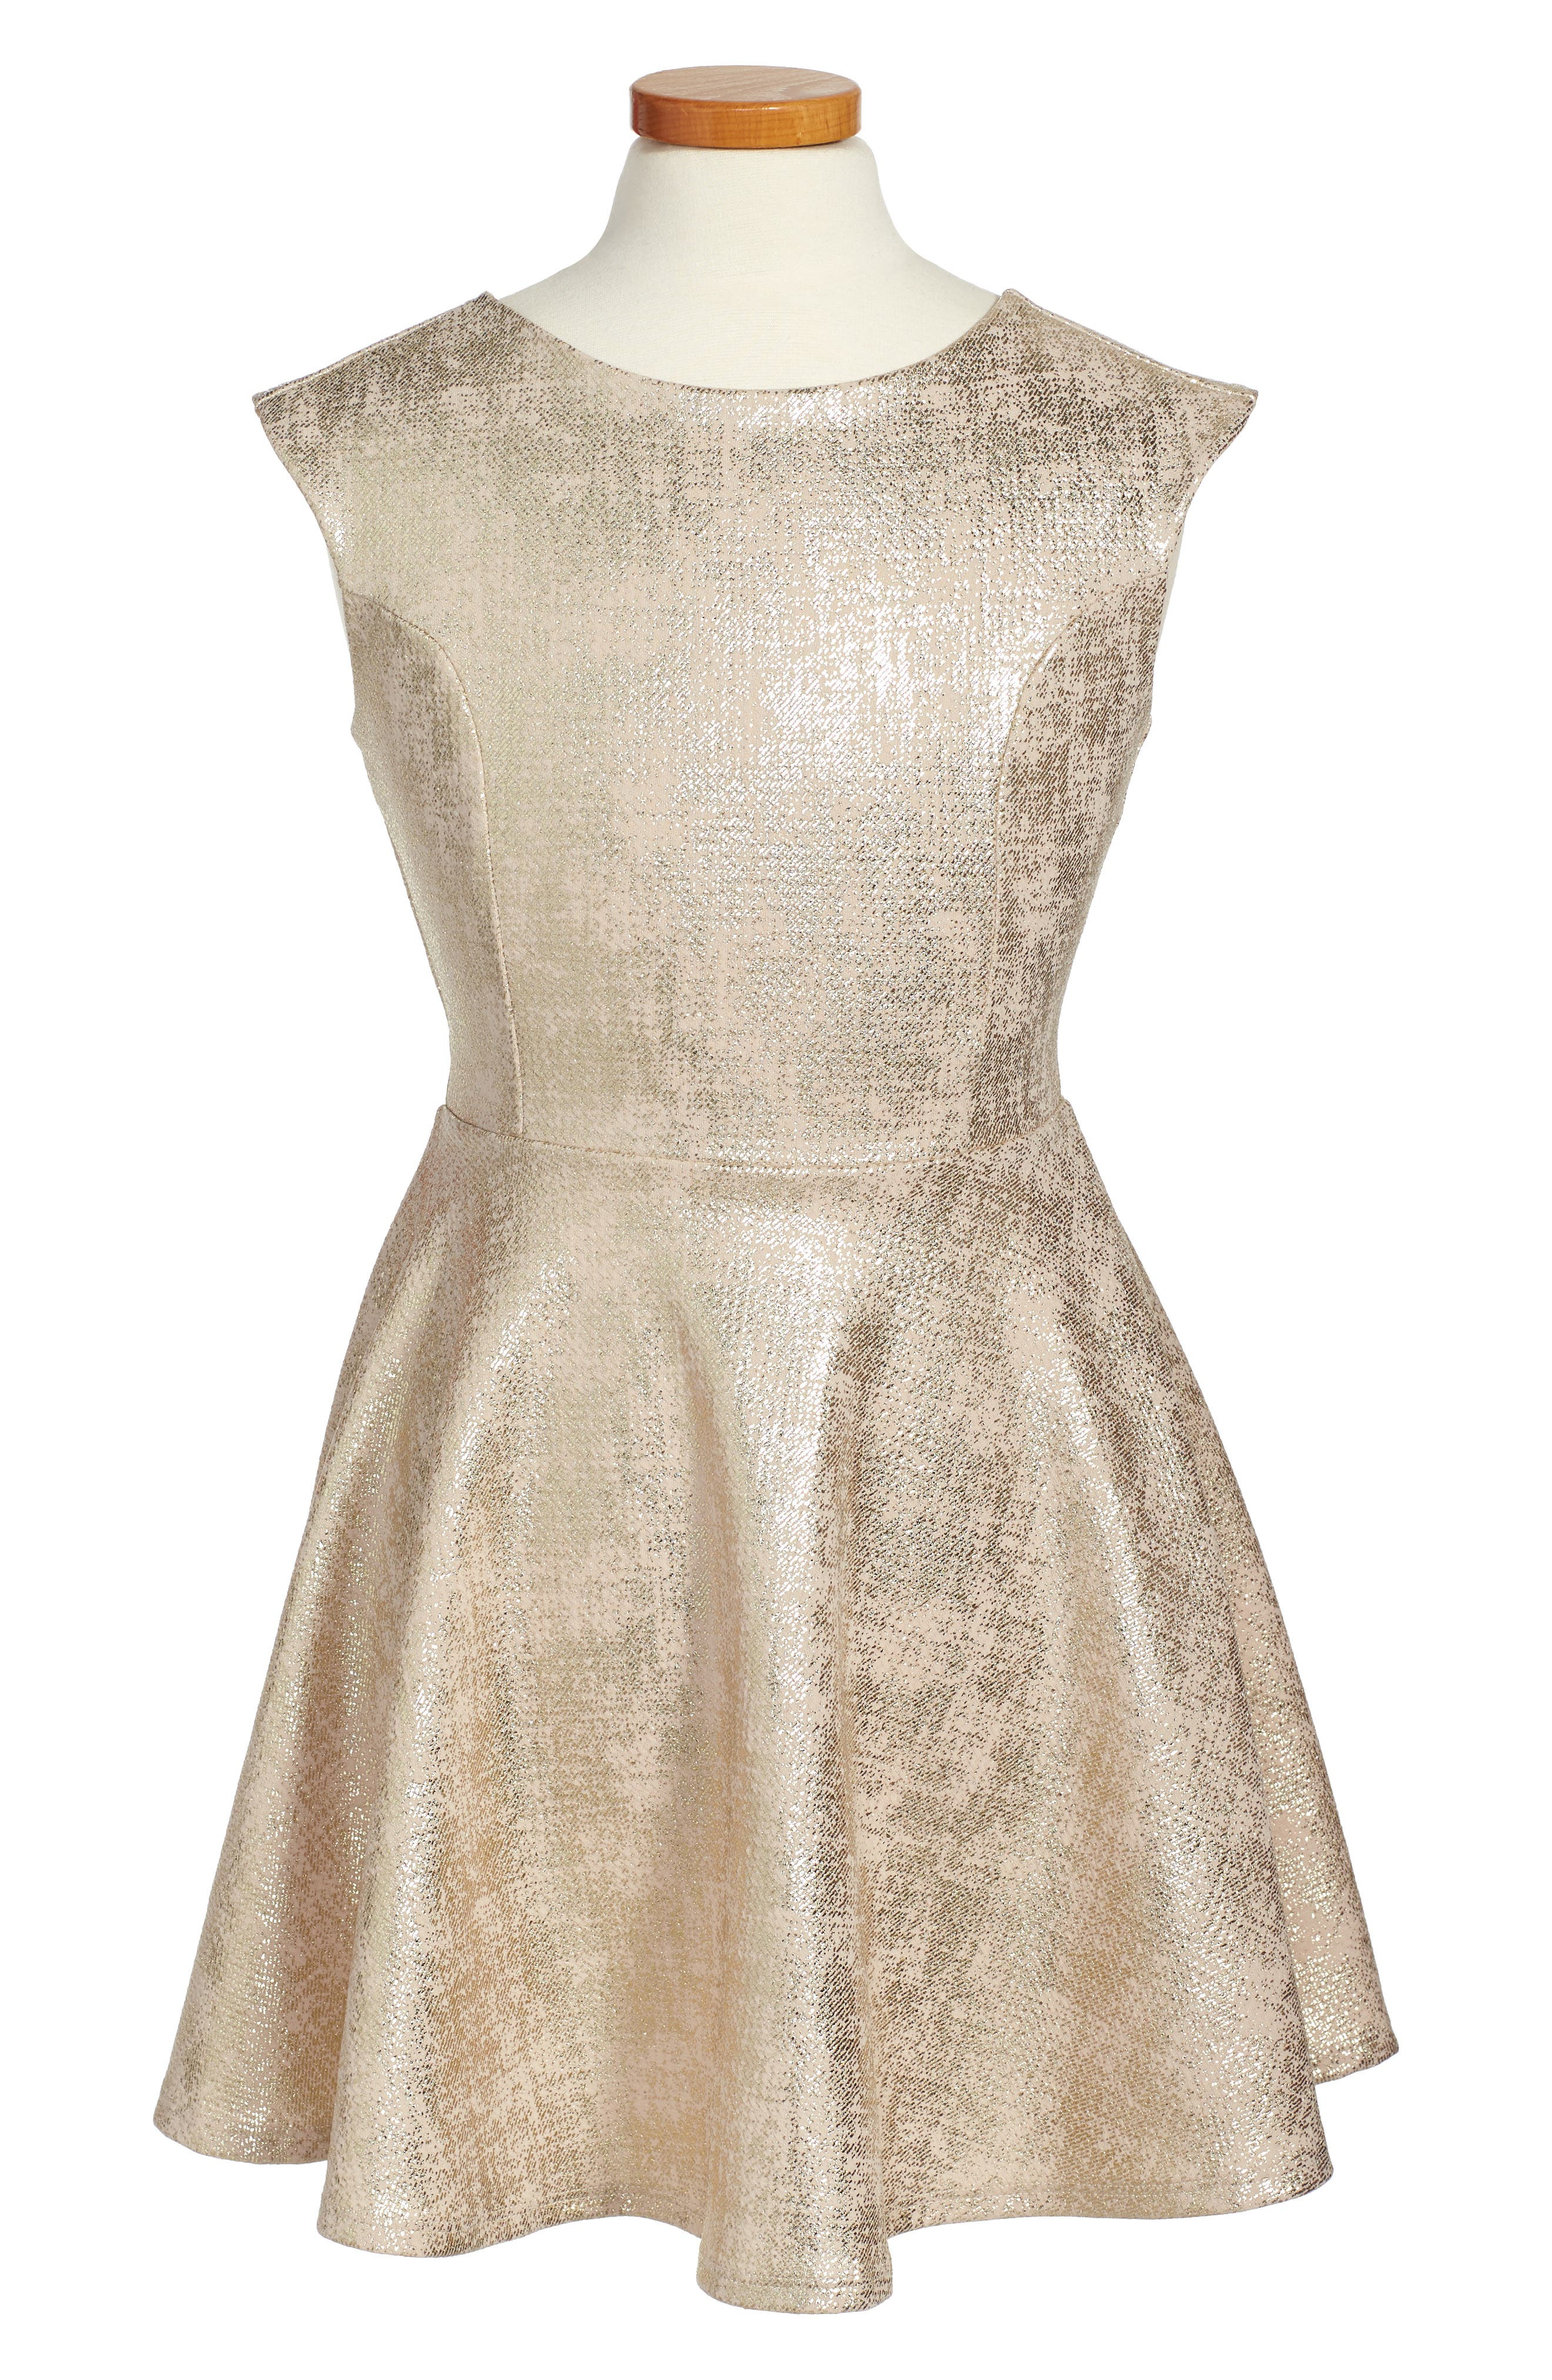 Cap Sleeve Party Dress,                             Main thumbnail 1, color,                             710